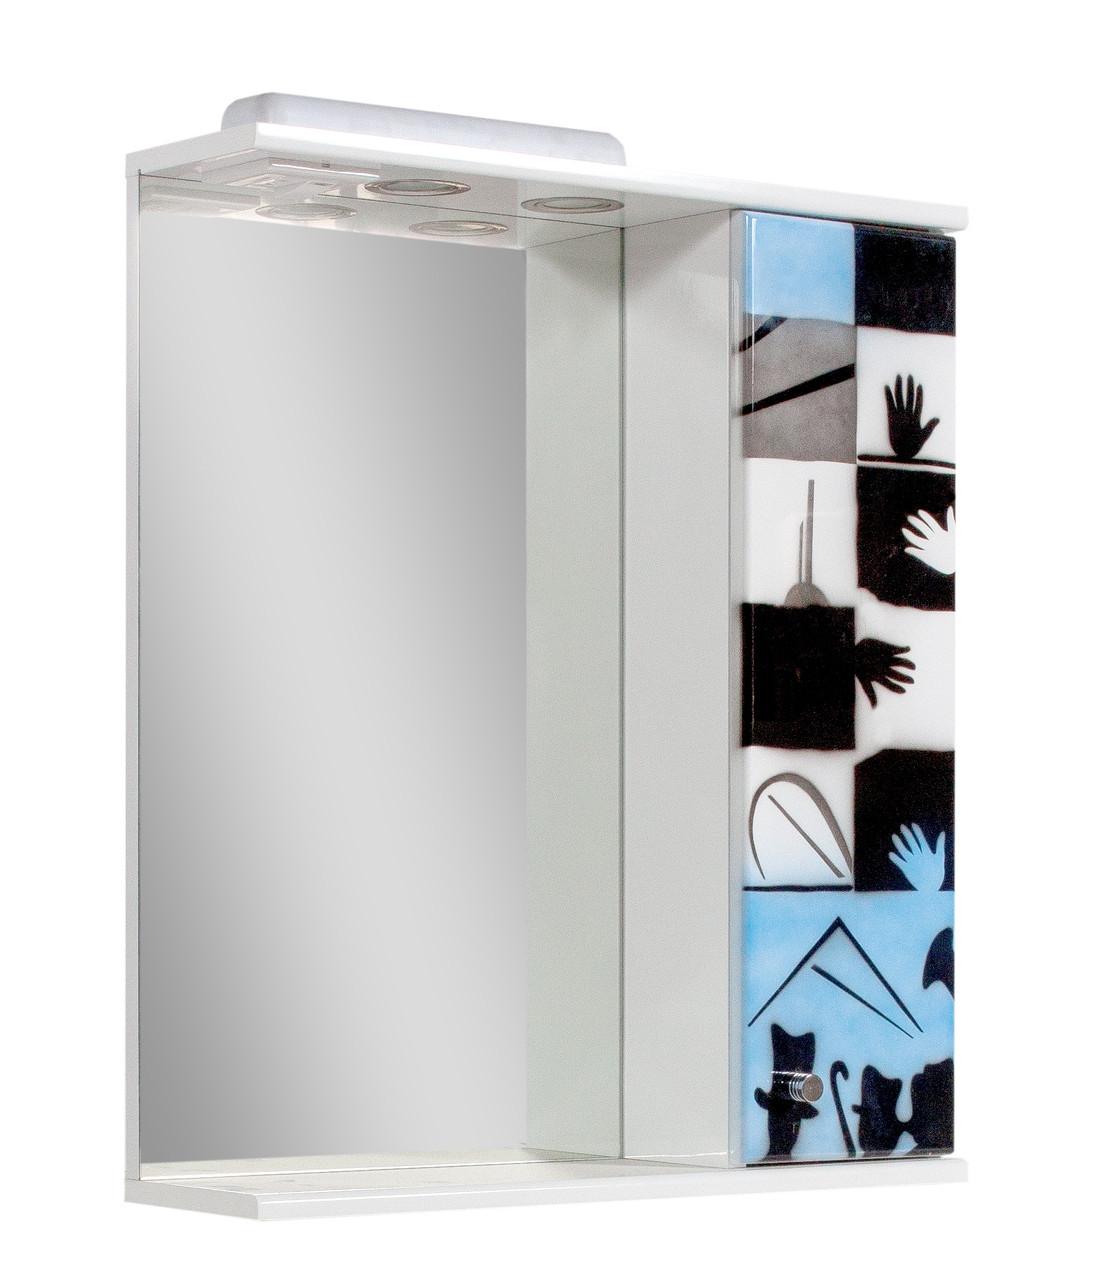 Зеркало для ванной комнаты Аэрография 60-01 правое Авангард